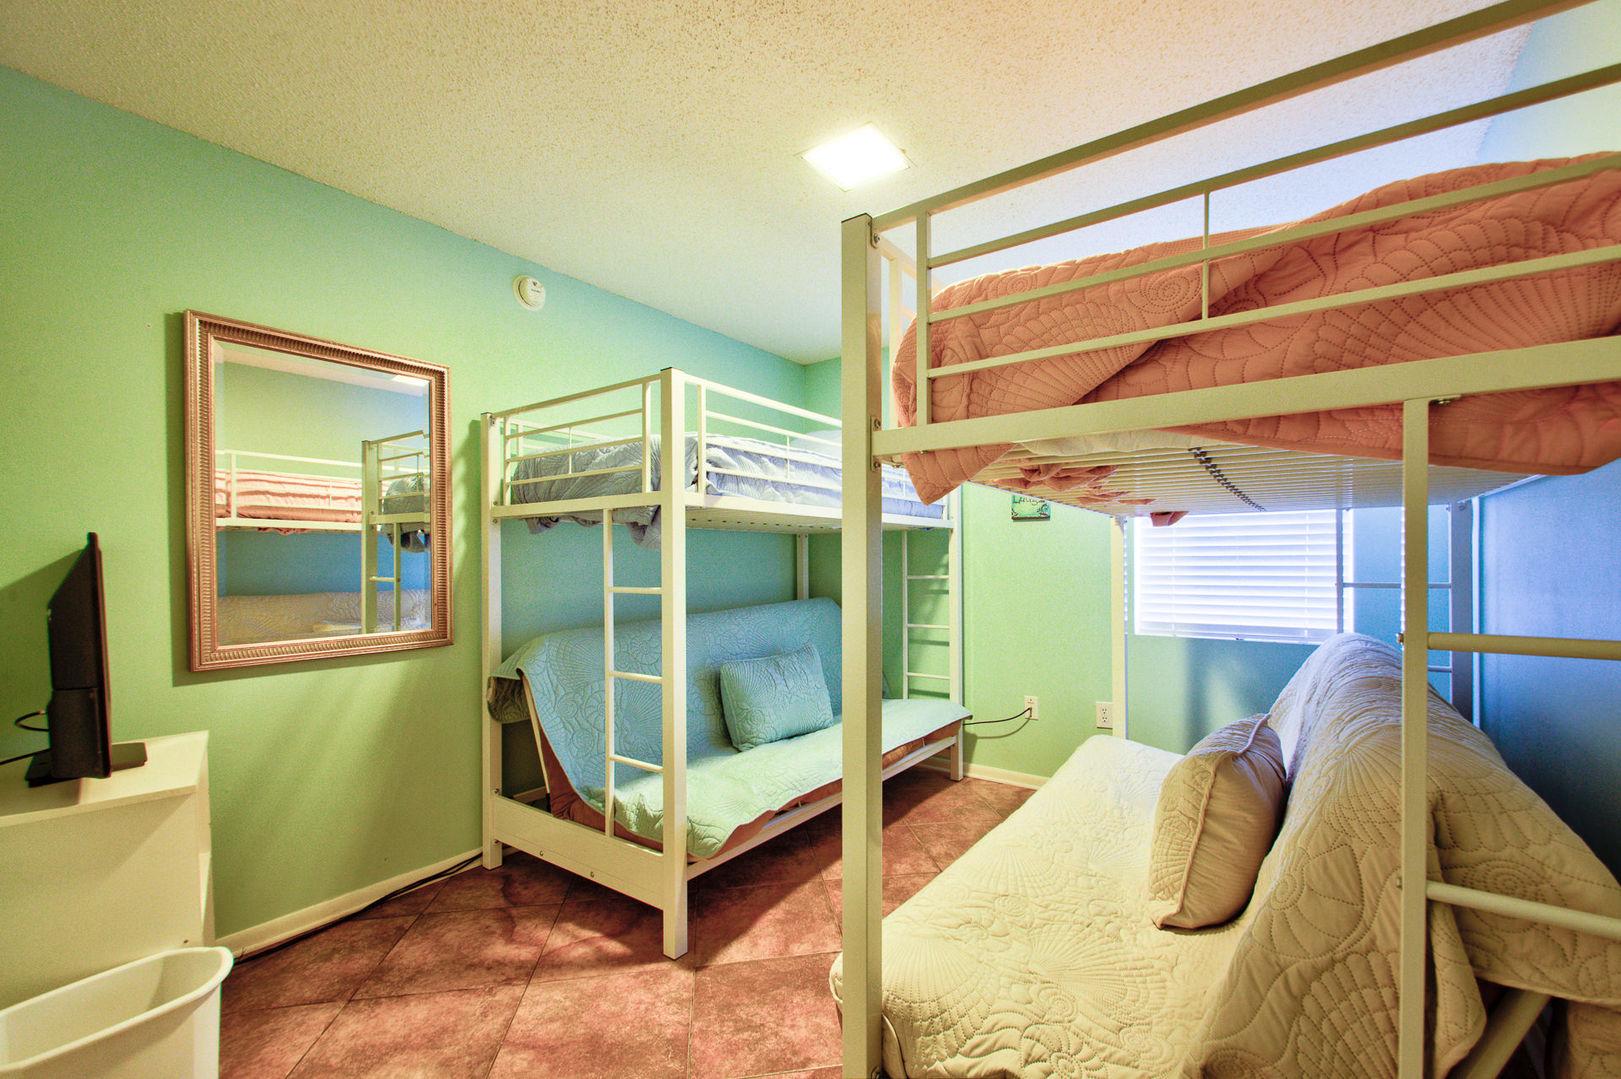 Bedroom #2 Features Two Bunk Beds